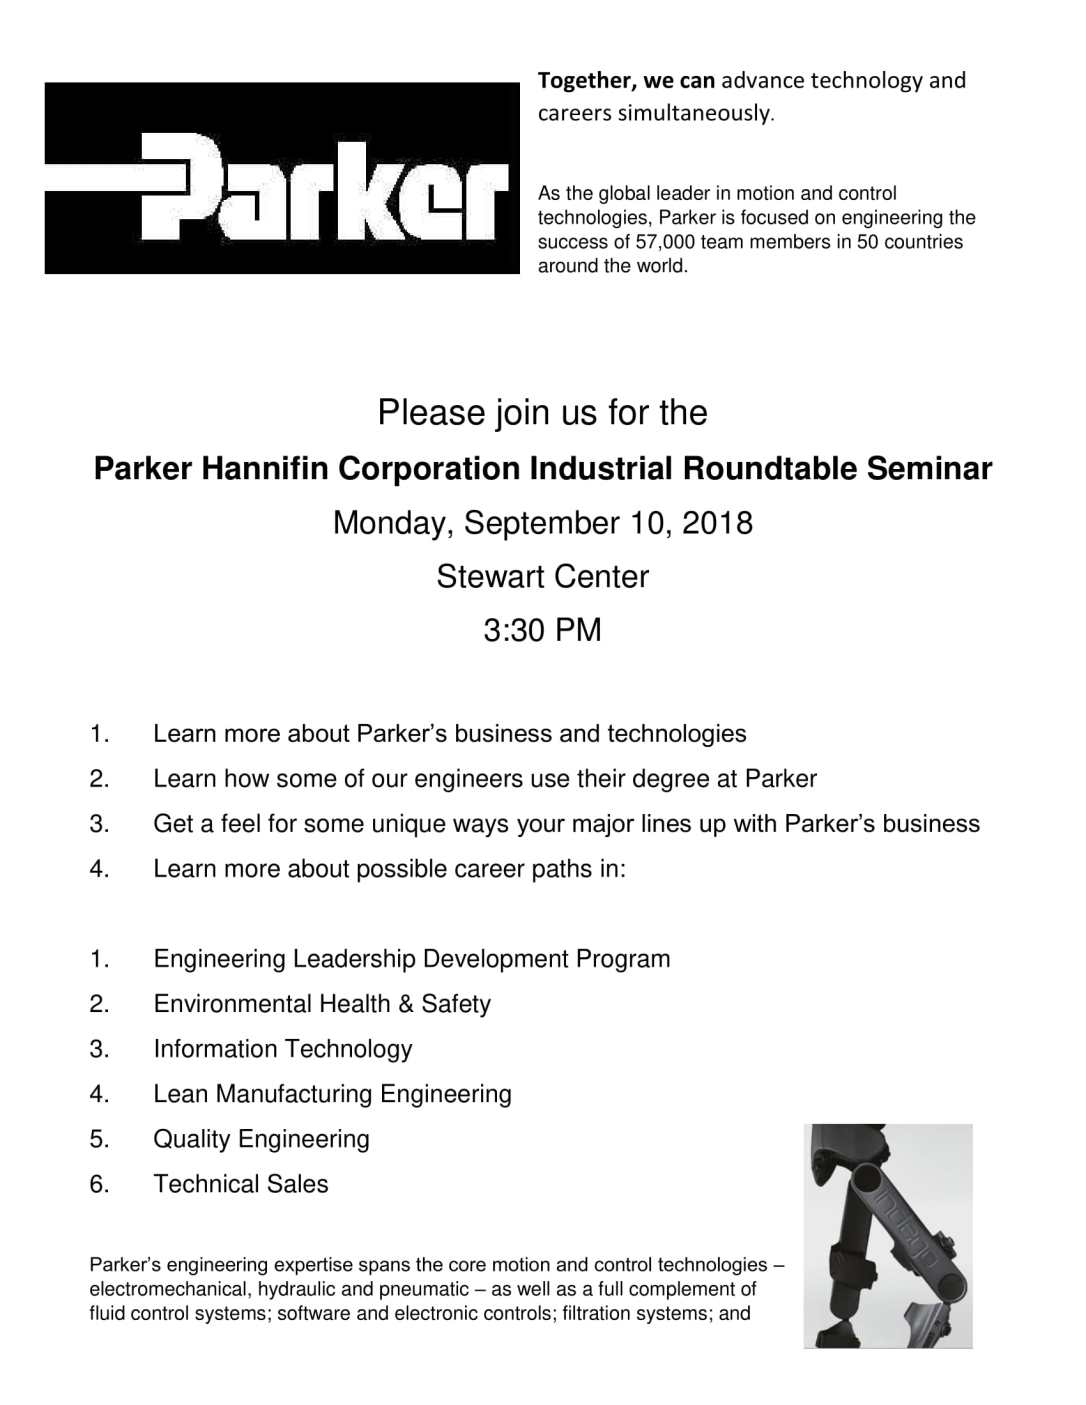 Purdue Industrial Roundtable Seminar flyer 2018-1